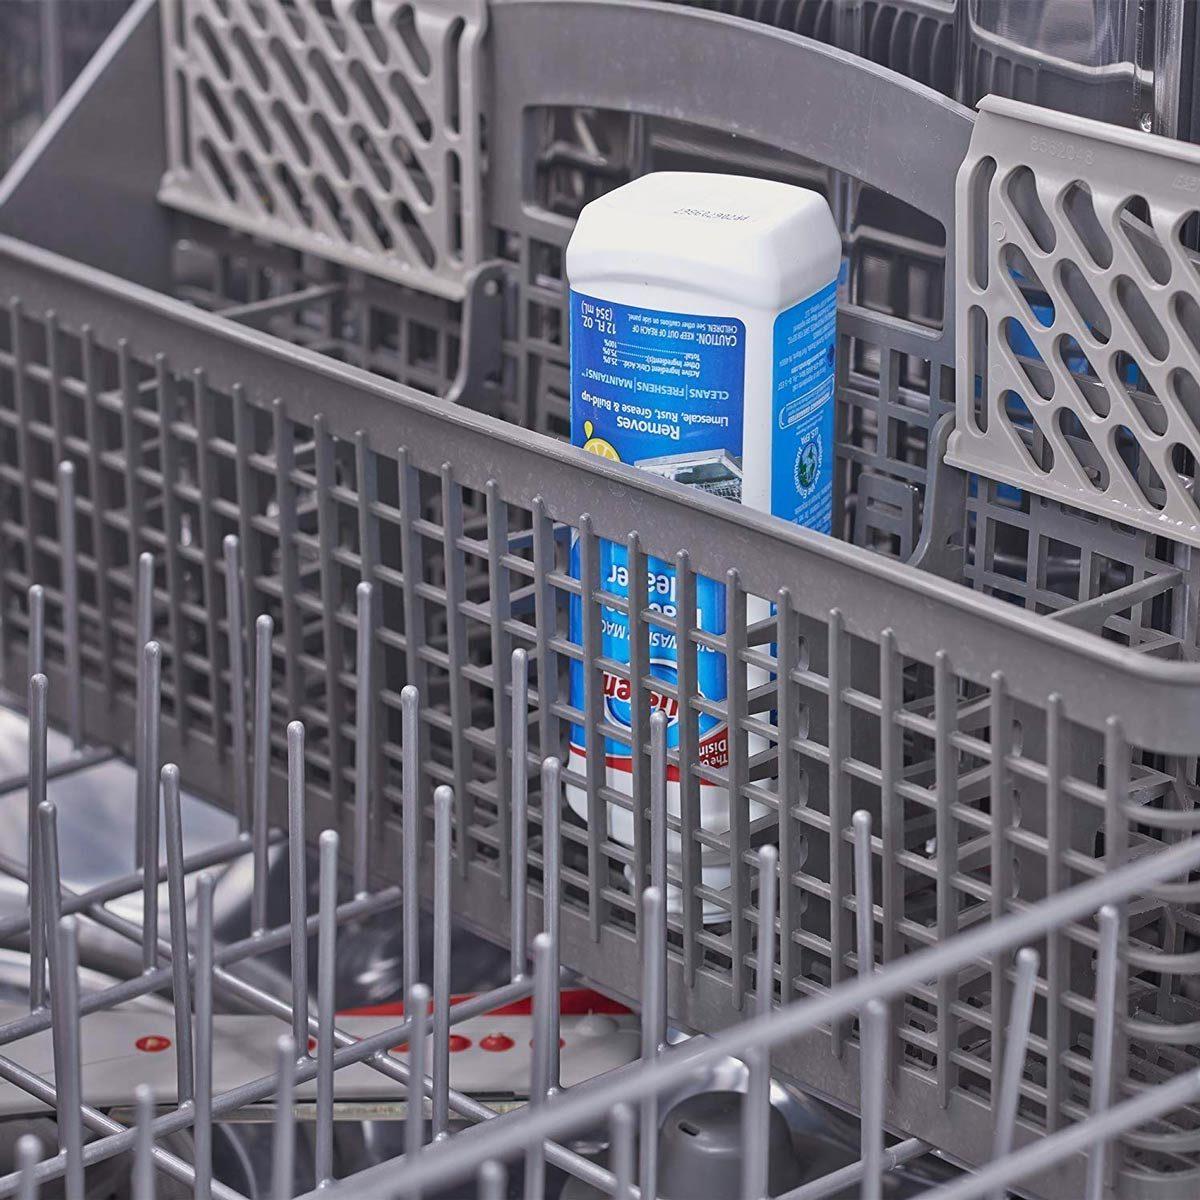 Glisten Dishwasher magic disinfectant